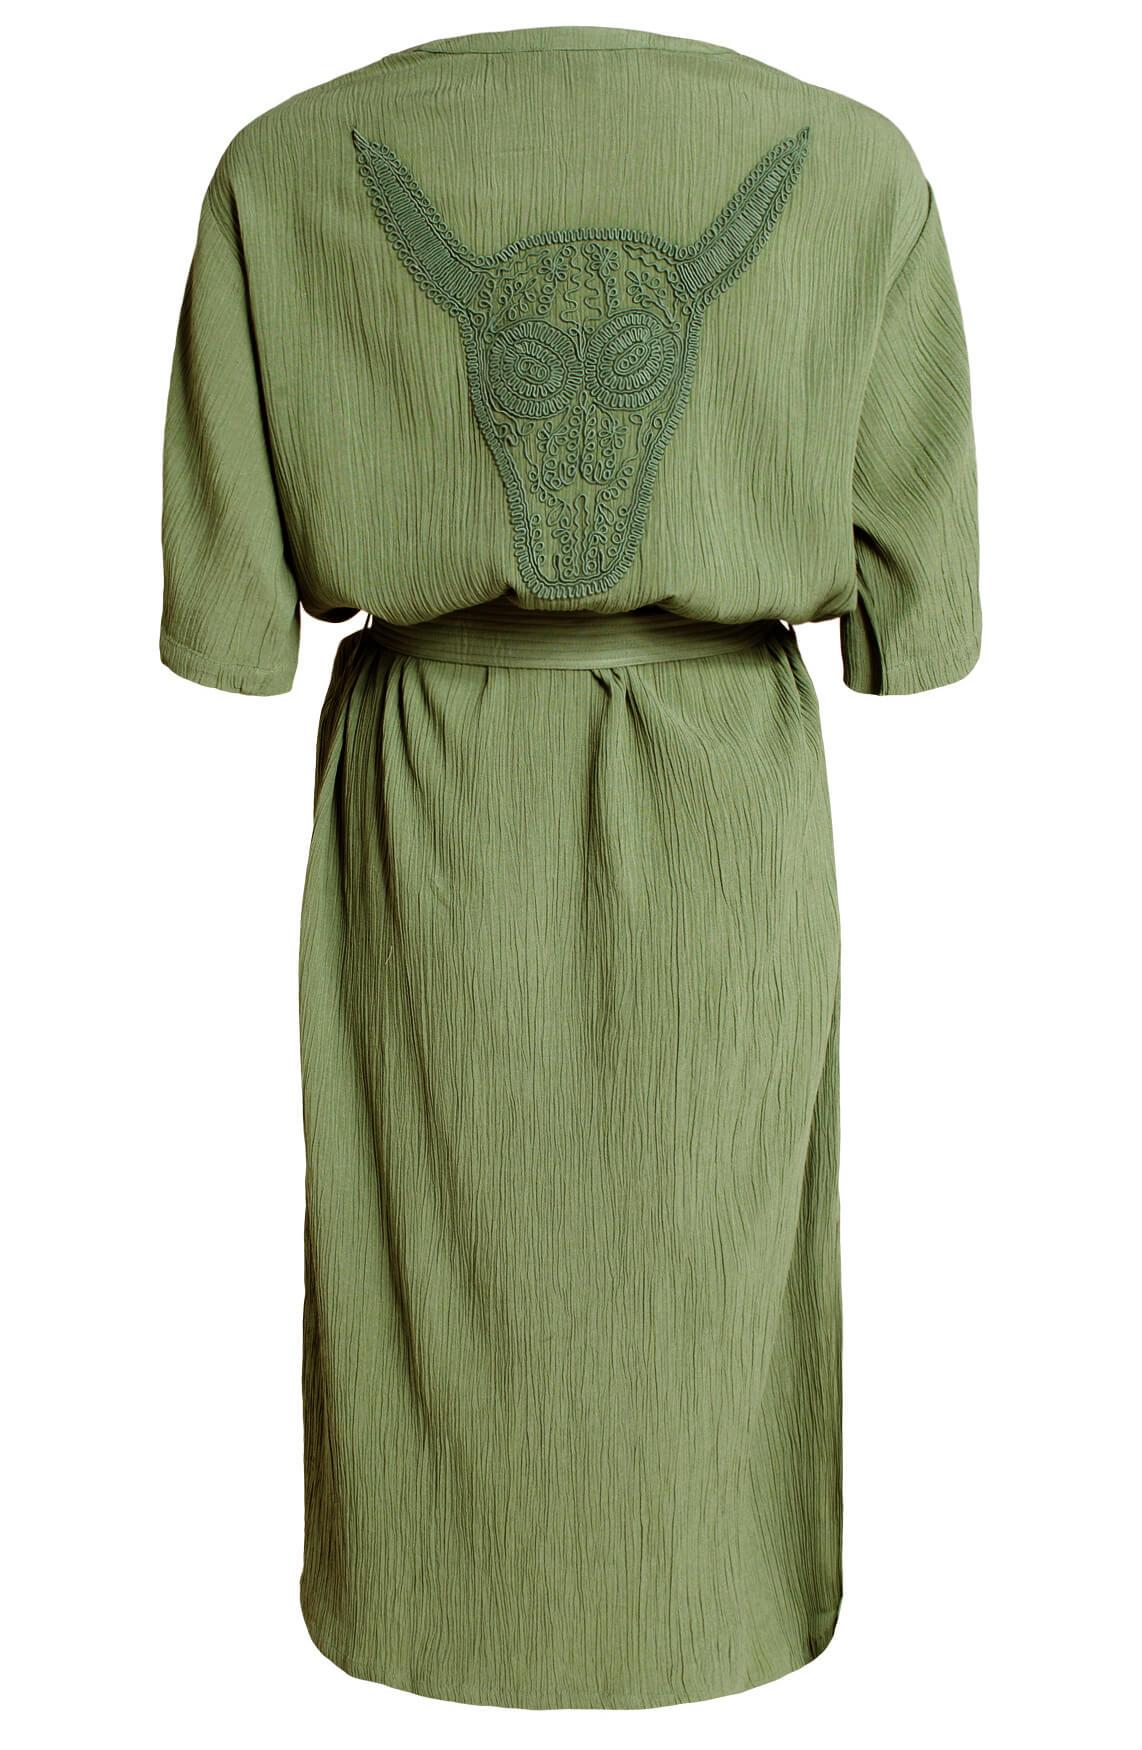 Alix The Label Dames Crinkle jurk groen